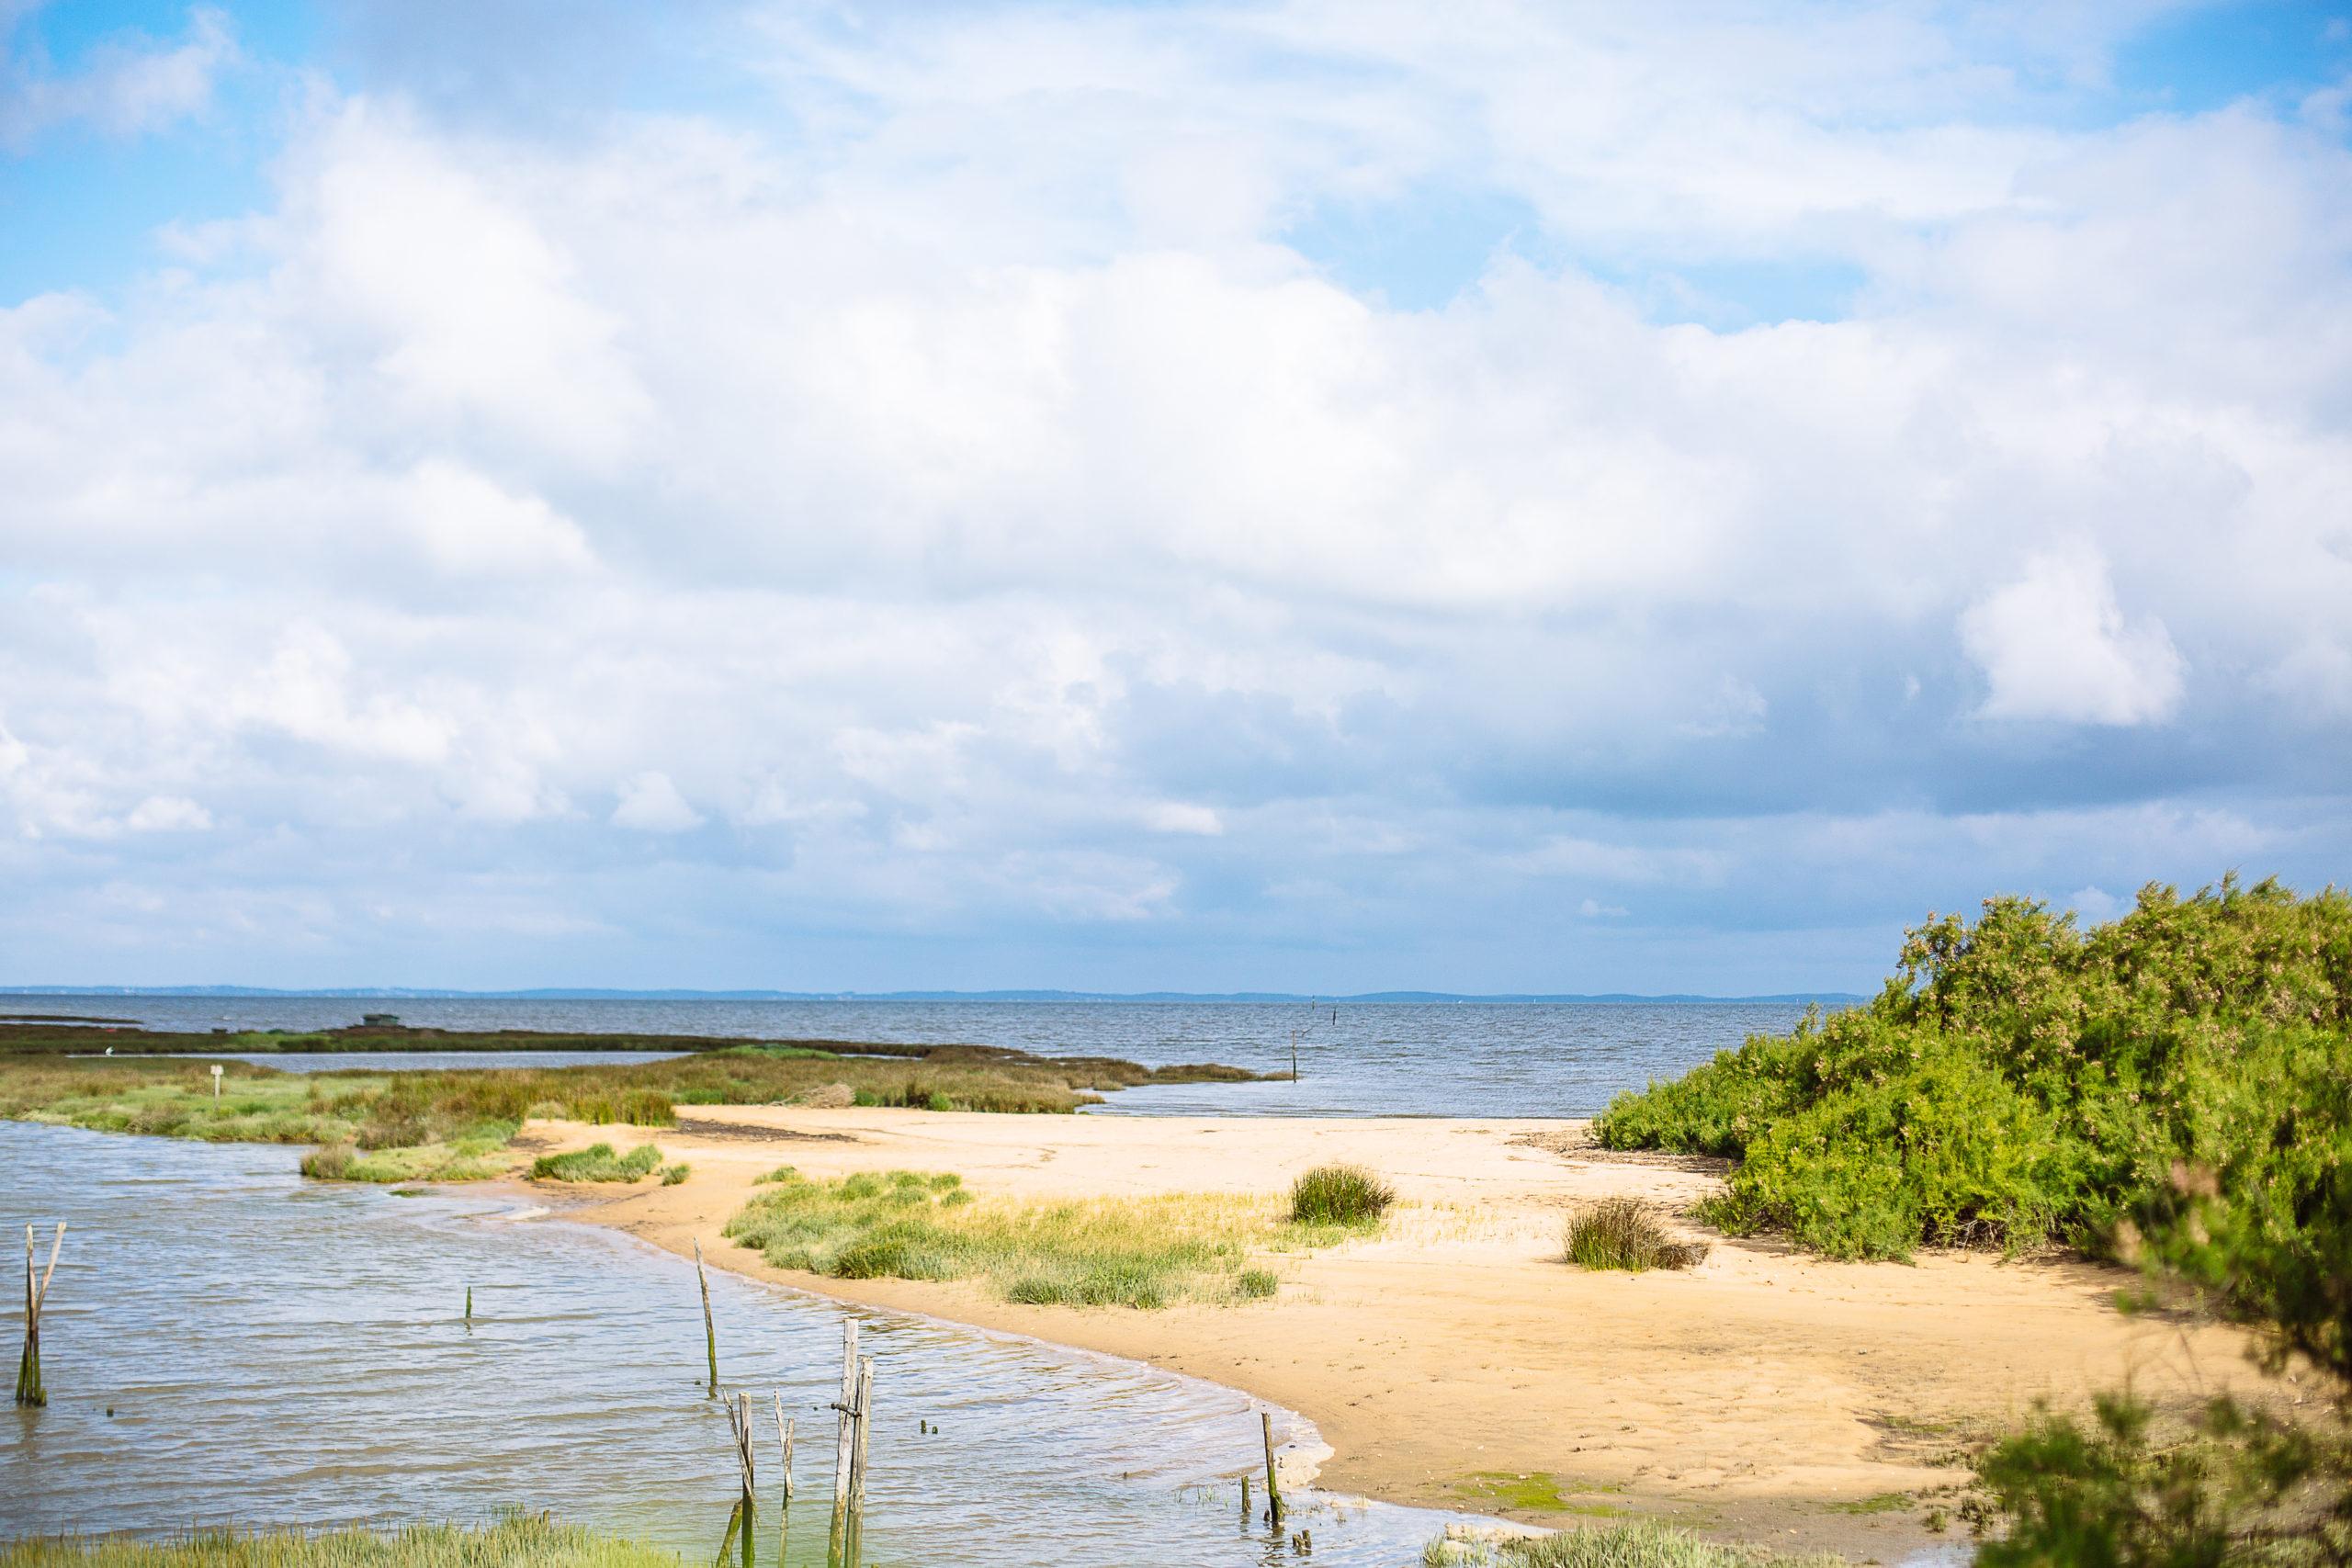 Les balades nature de Béa - Agenda Nature du Teich